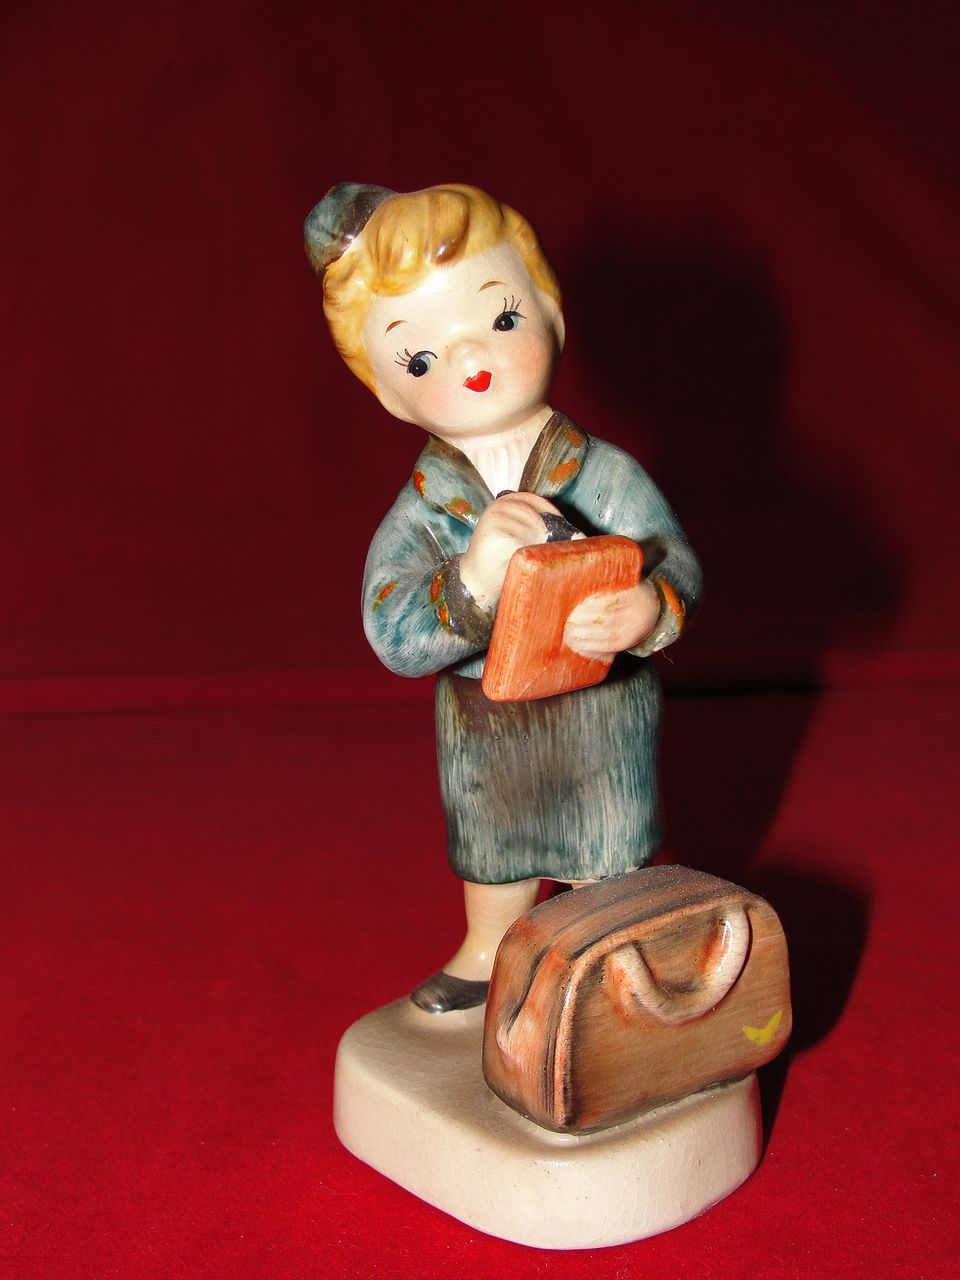 Lefton 1957 Stewardess Ceramic Figurine